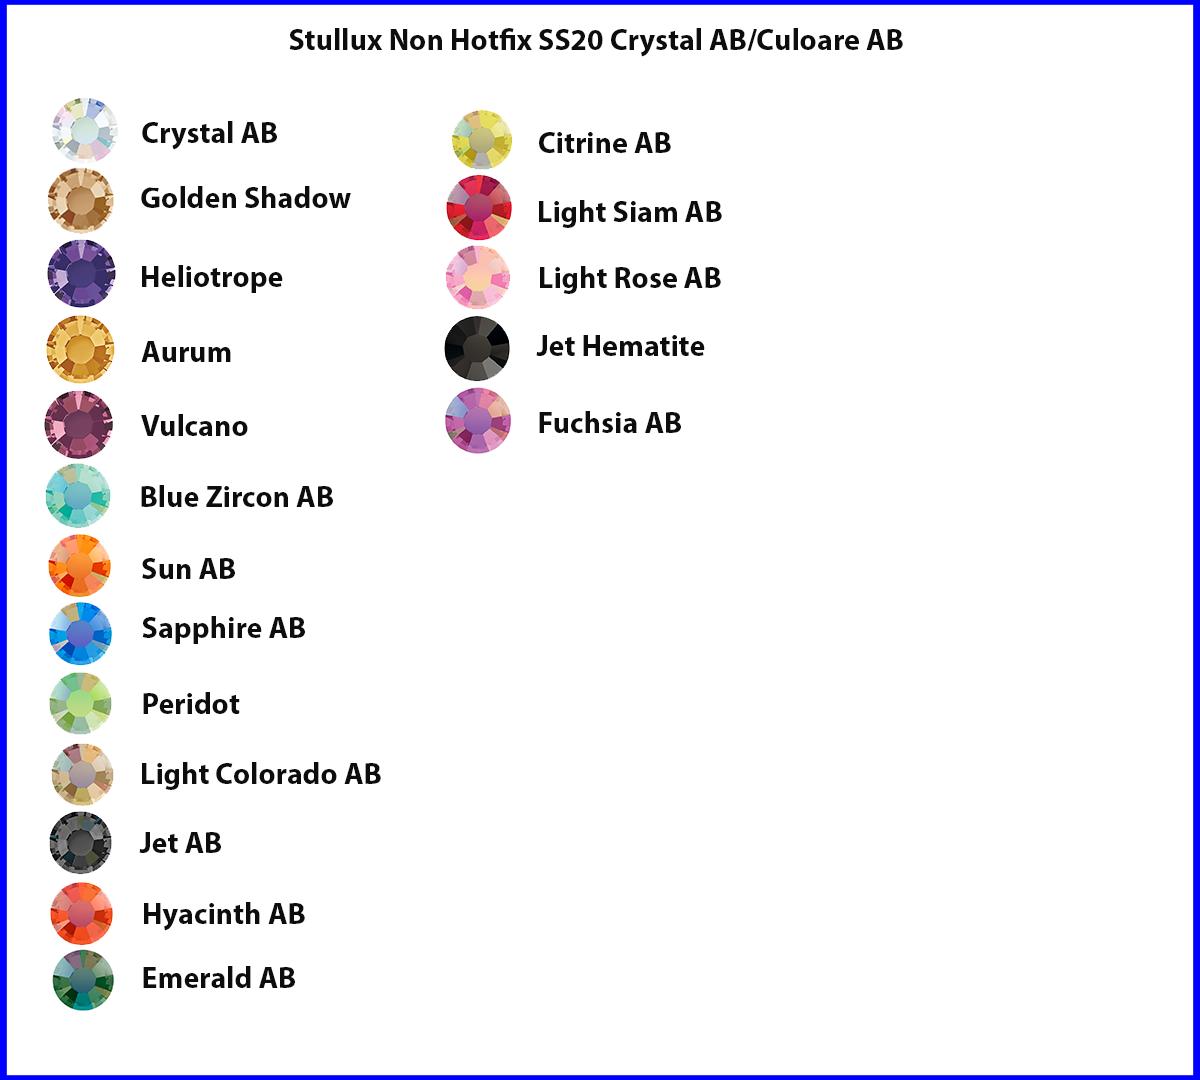 Stellux Non Hotfix SS20 Crystal AB/Culoare AB